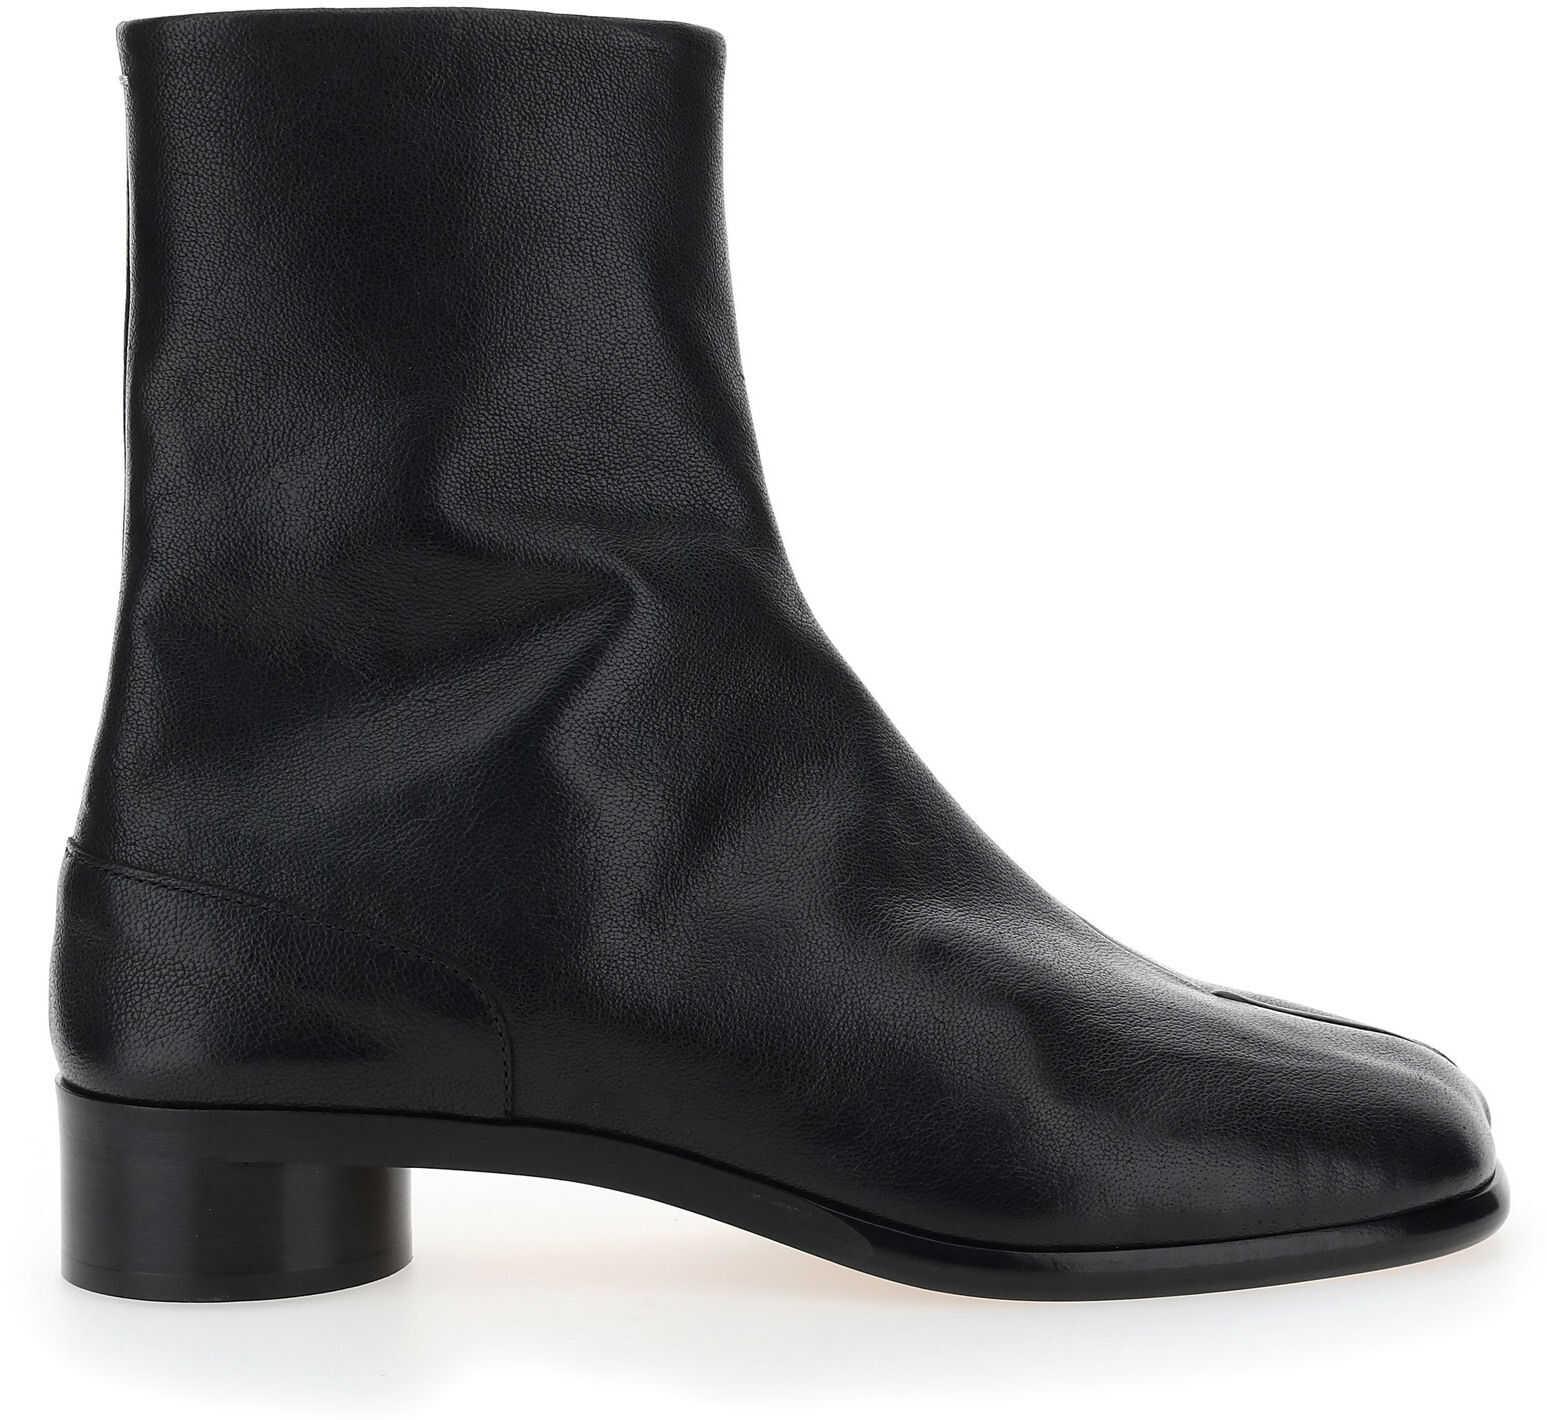 Maison Margiela Boots S57WU0221P3962 BLACK/ECRU imagine b-mall.ro